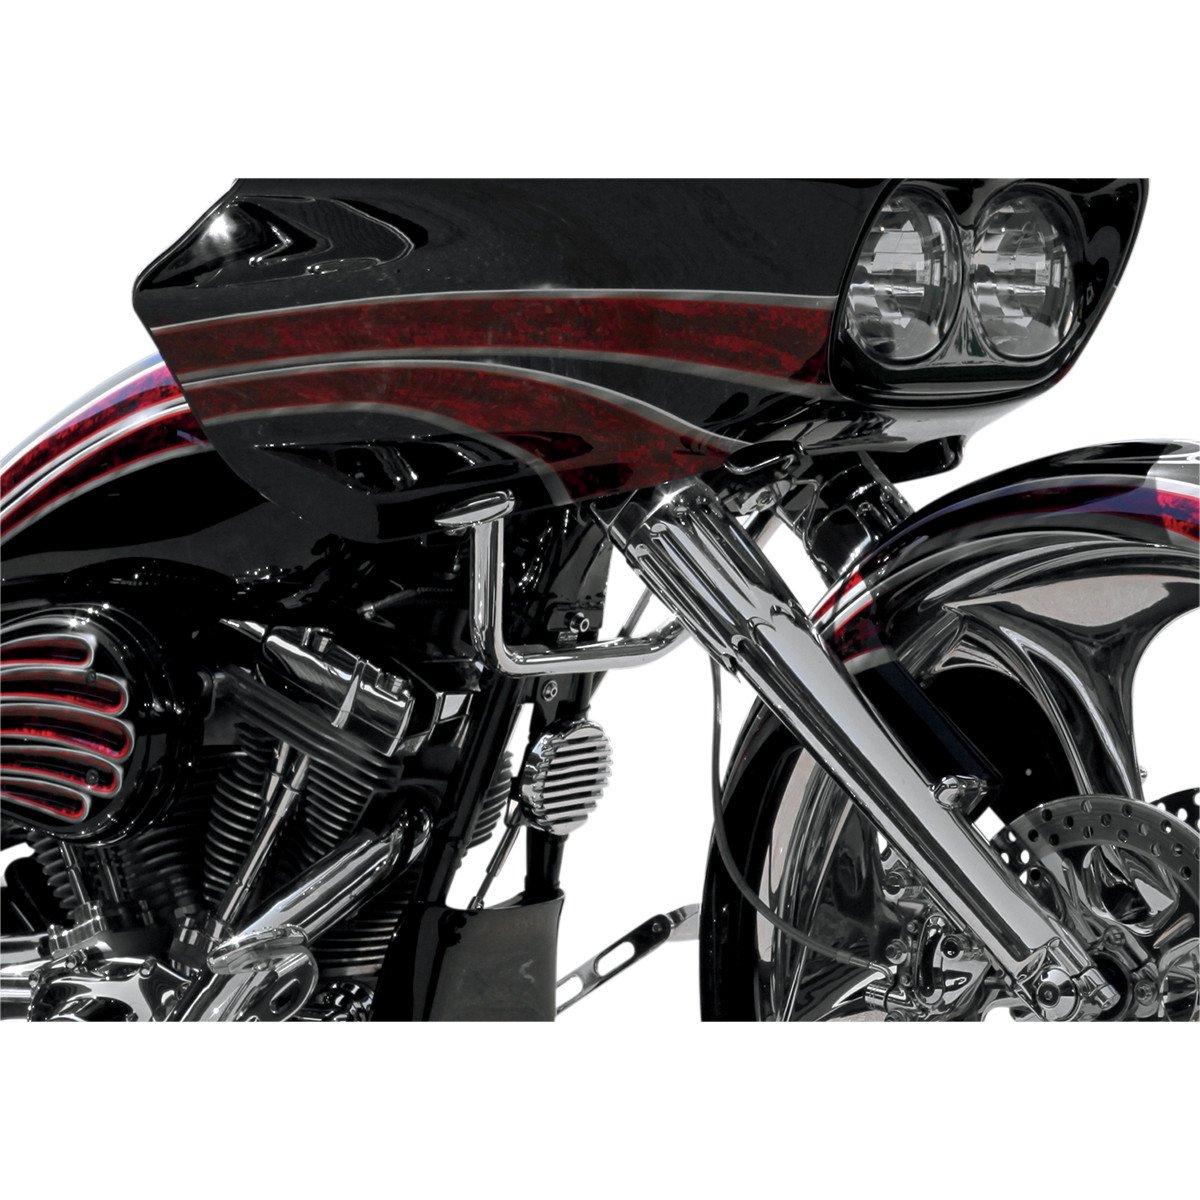 Paul Yaffe Originals MBB-125-12 B 12 Black Monkey Bar for Harley 86-13 FLHT FLHX